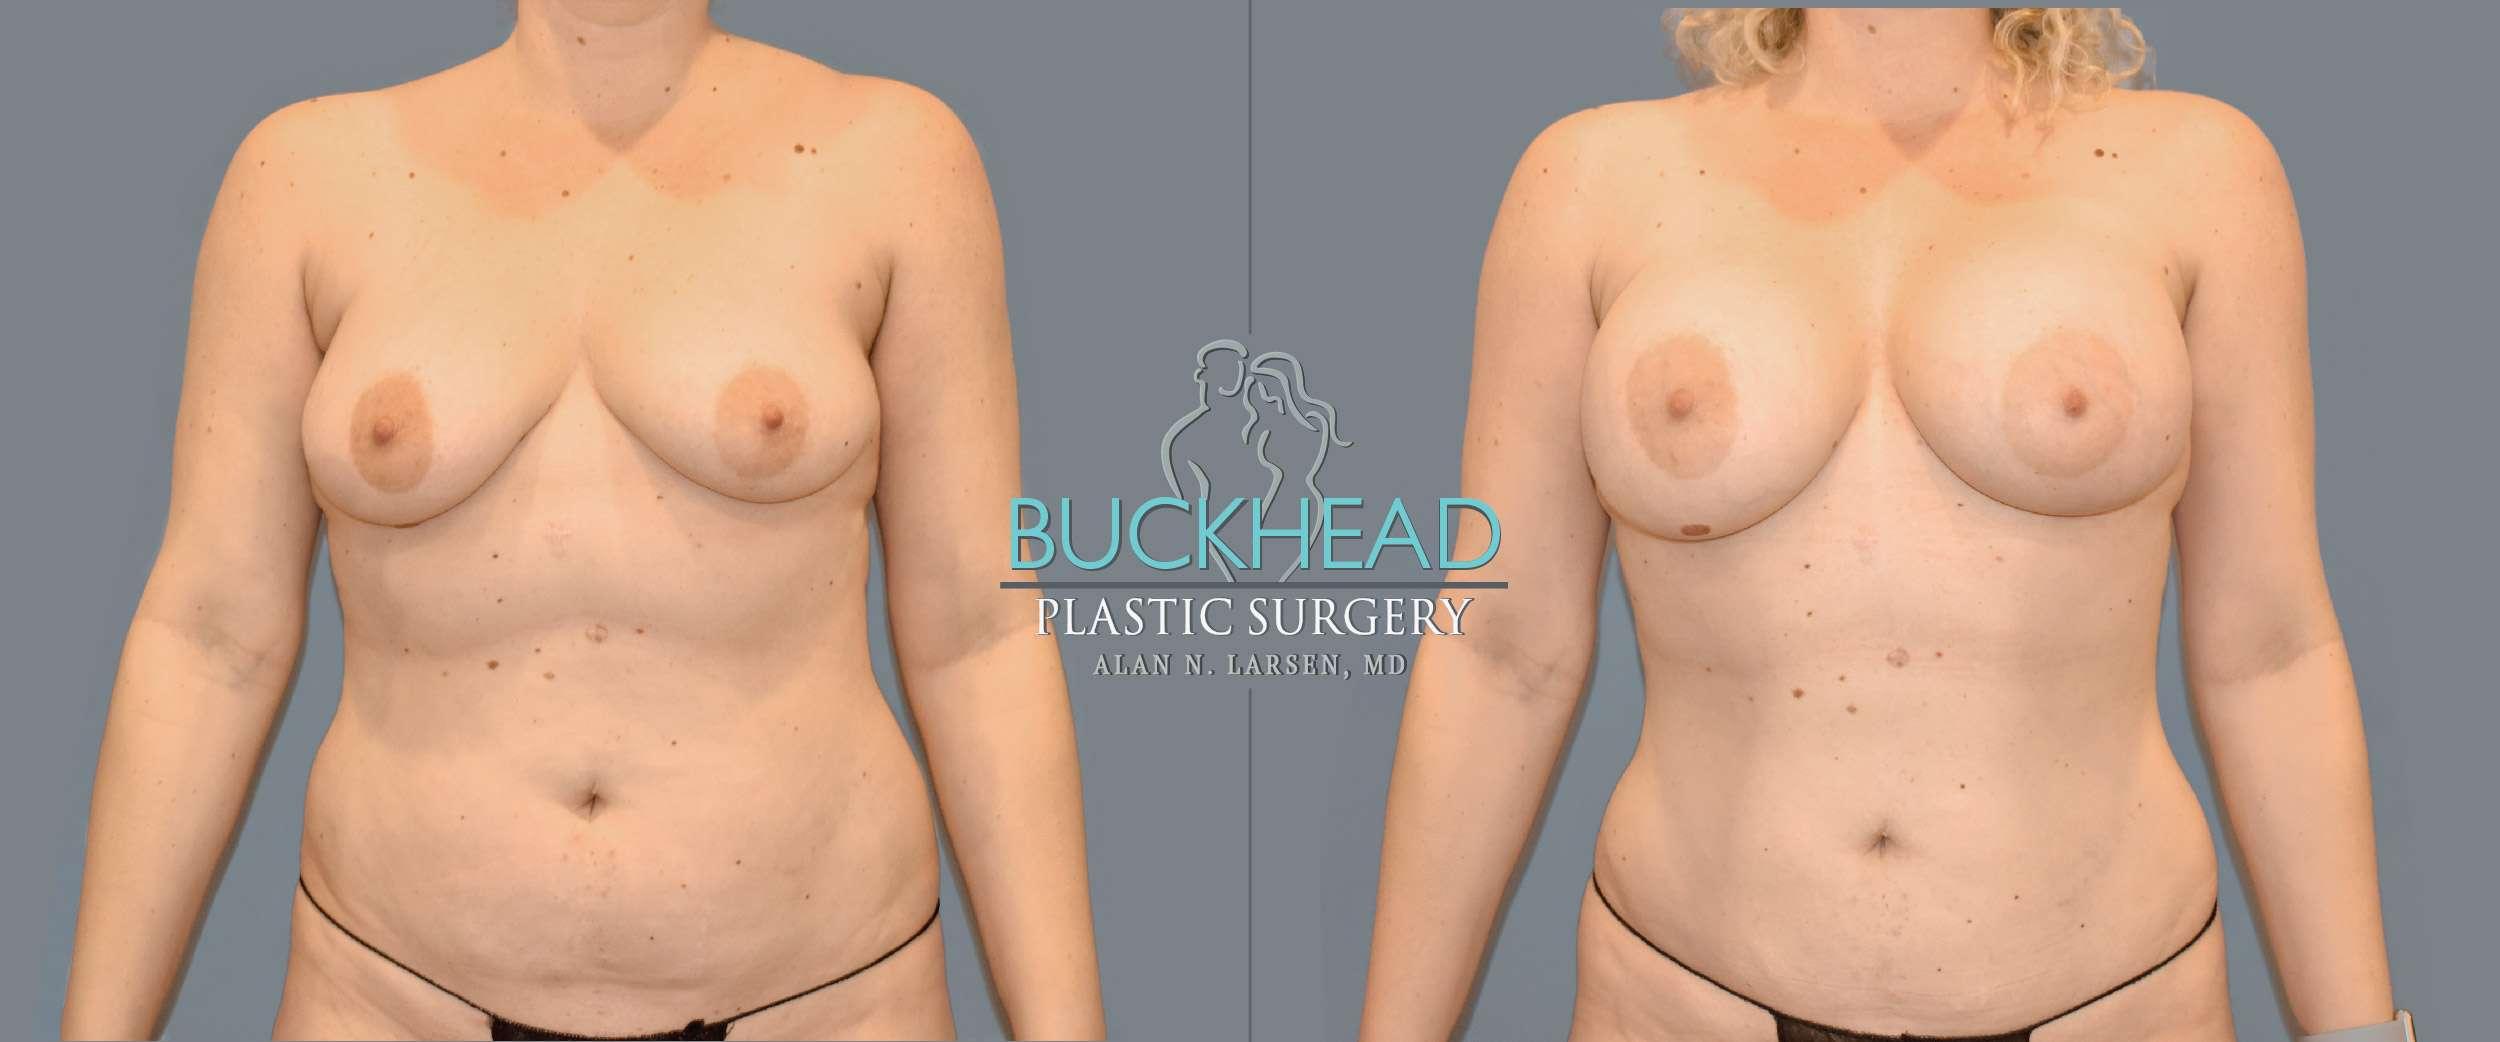 Before and After Photo Gallery | Liposuction | Buckhead Plastic Surgery | Alan N. Larsen, MD | Board-Certified Plastic Surgeon | Atlanta GA